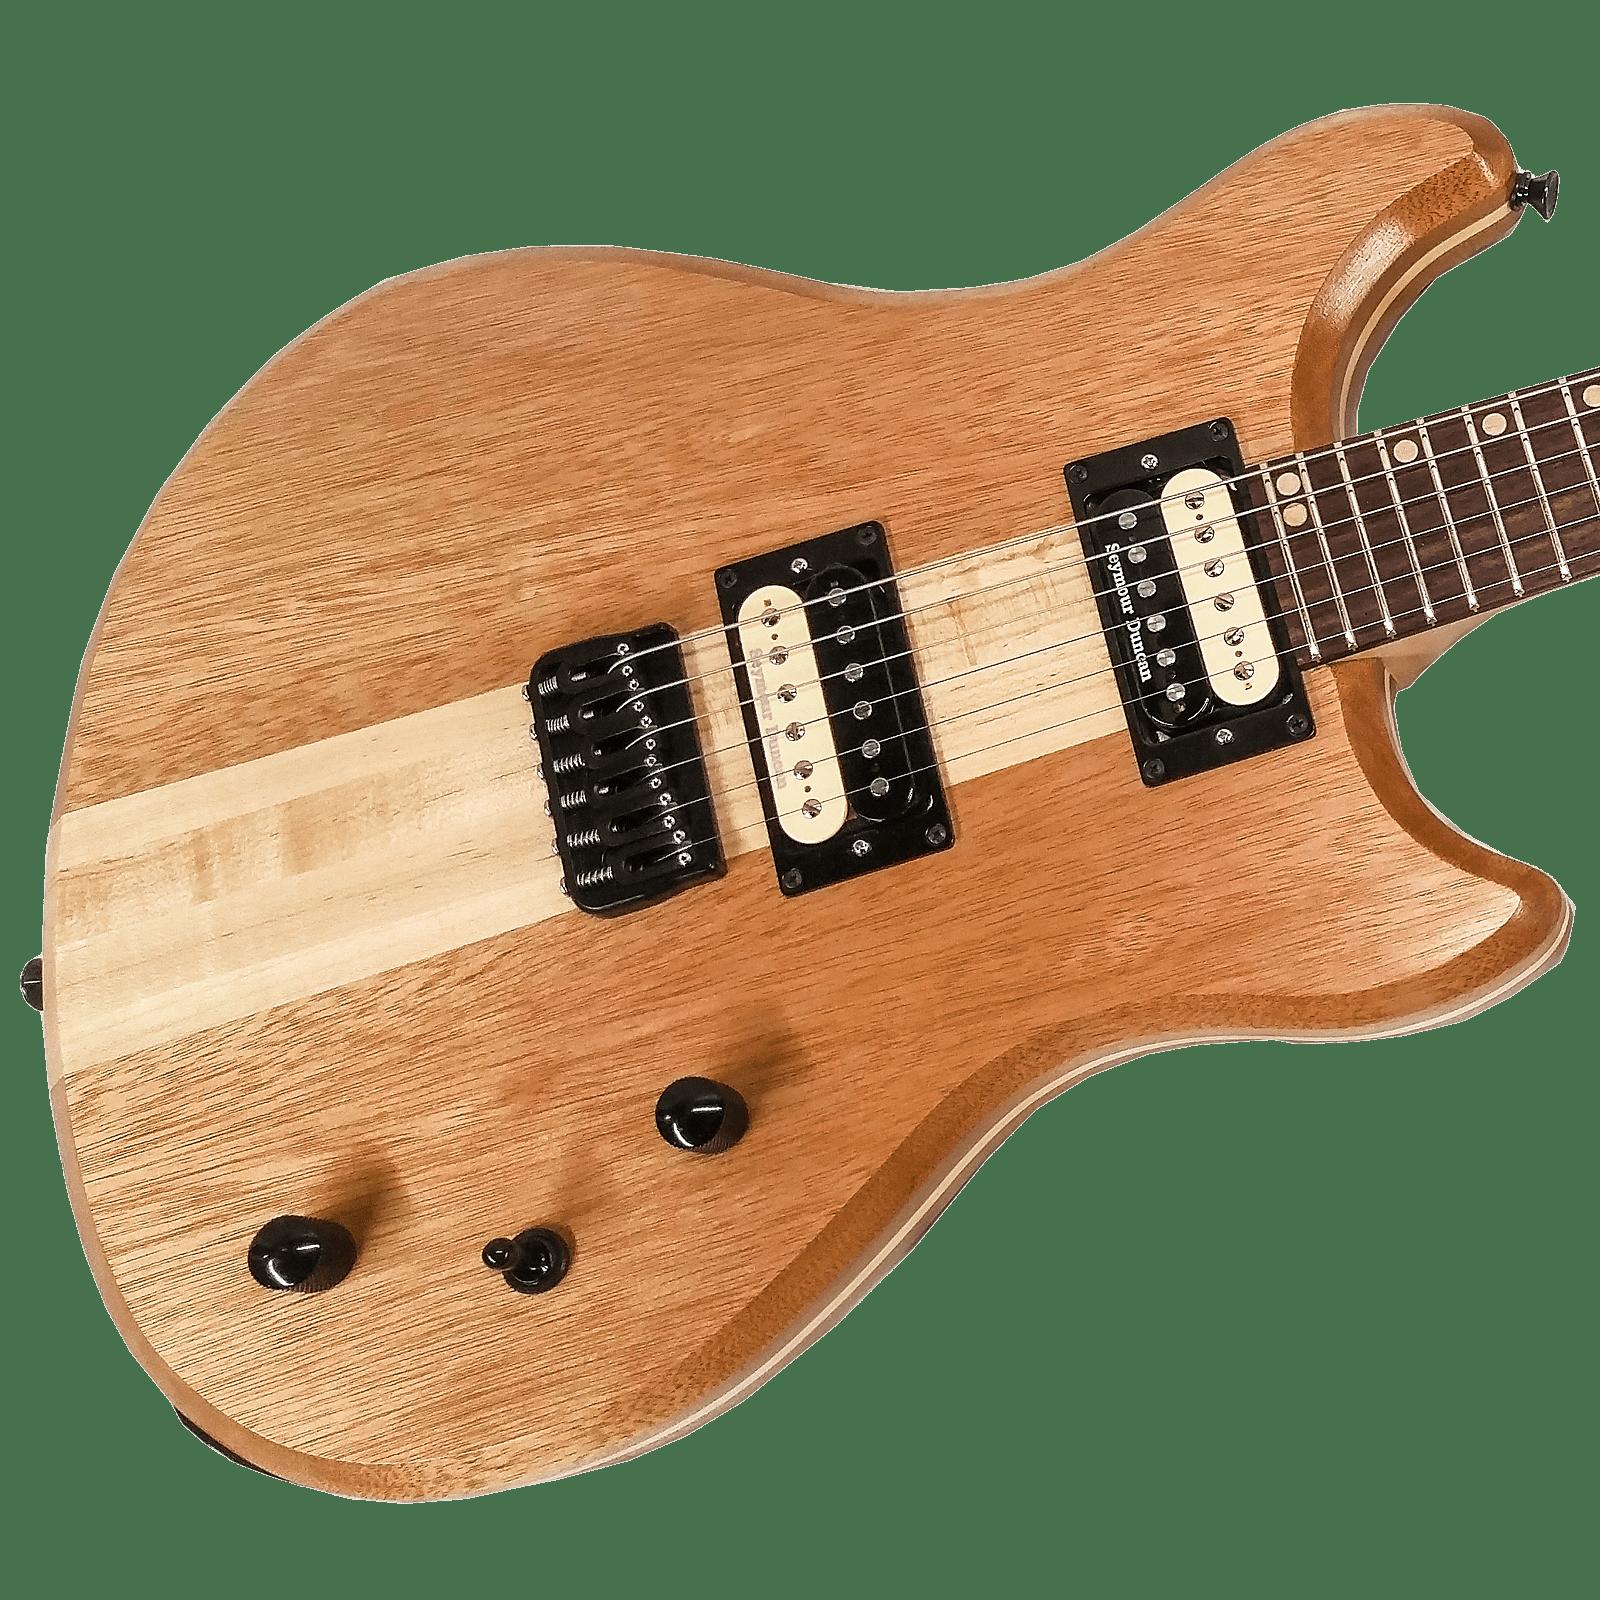 Lomic Gemini Offset Handmade Neck Through Electric Guitar 25.5 Scale #006 USA Made Mahogany